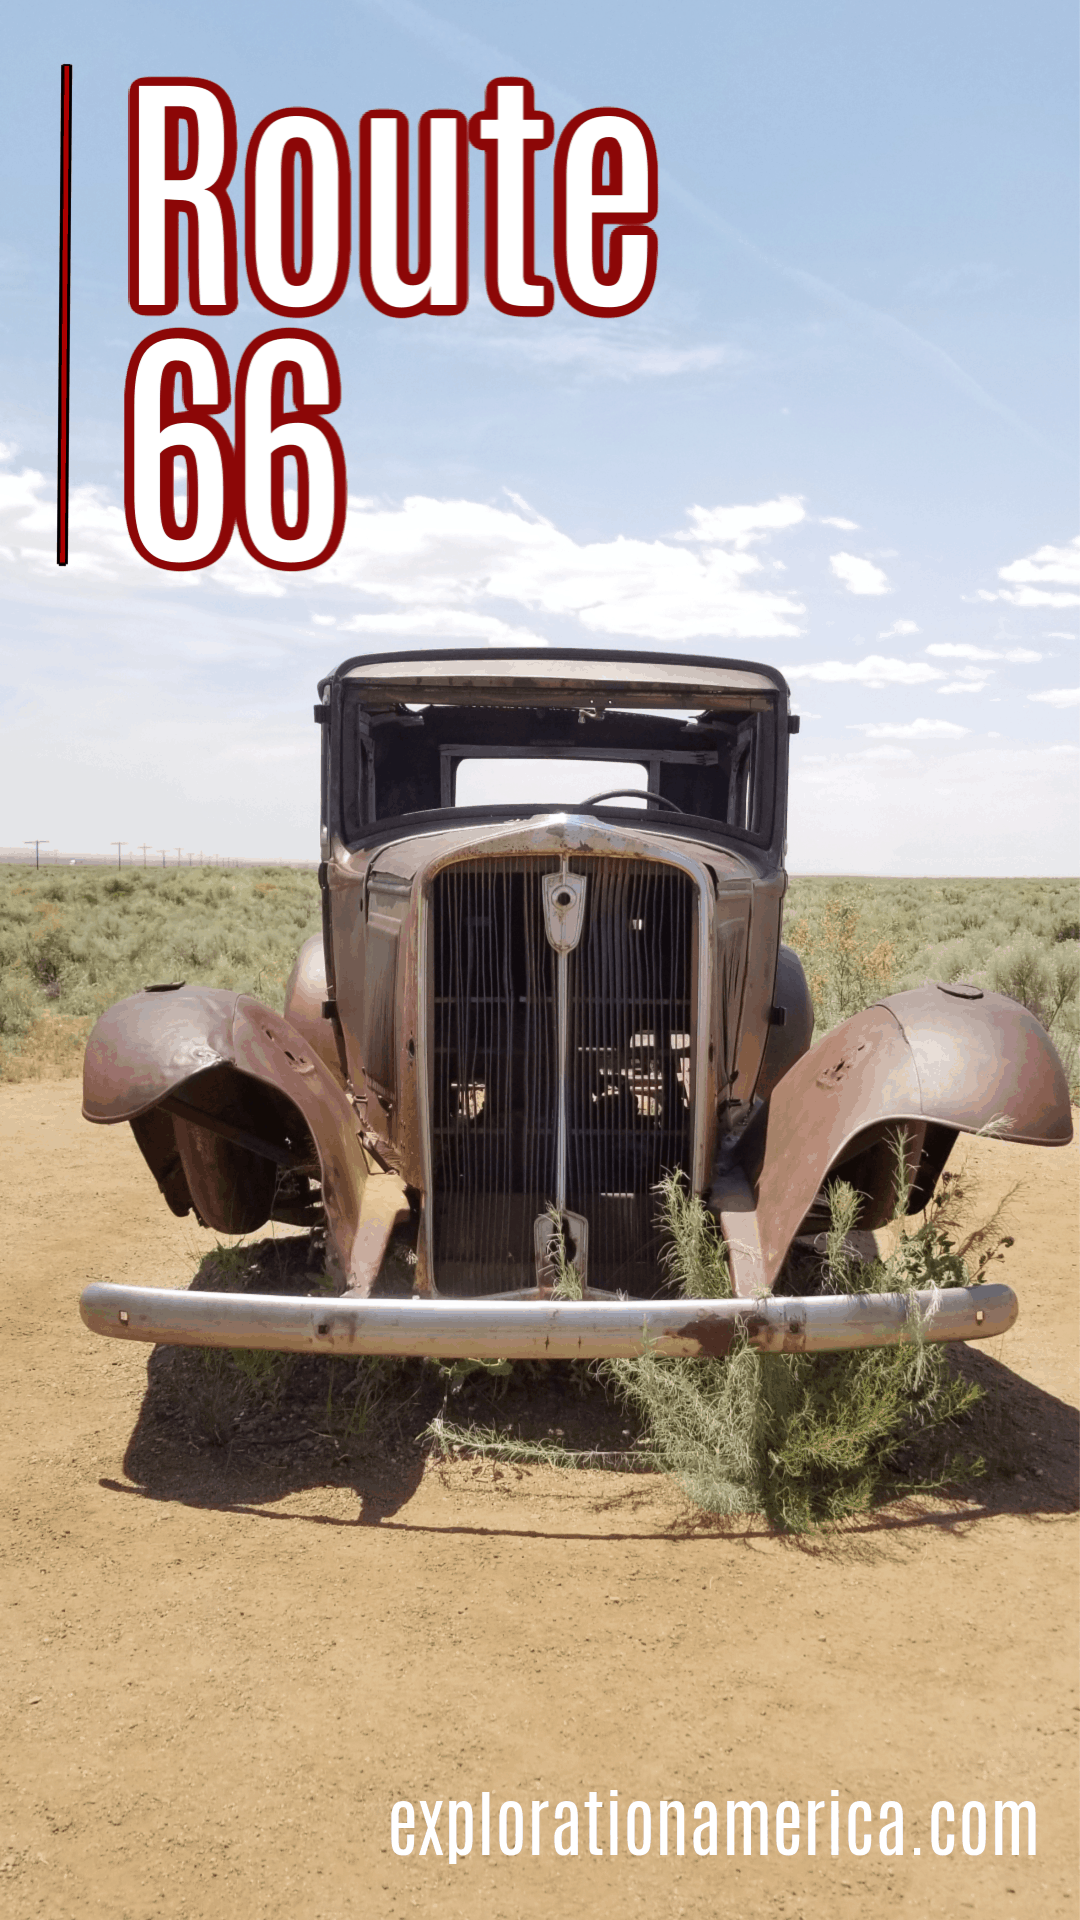 vintage car on route 66